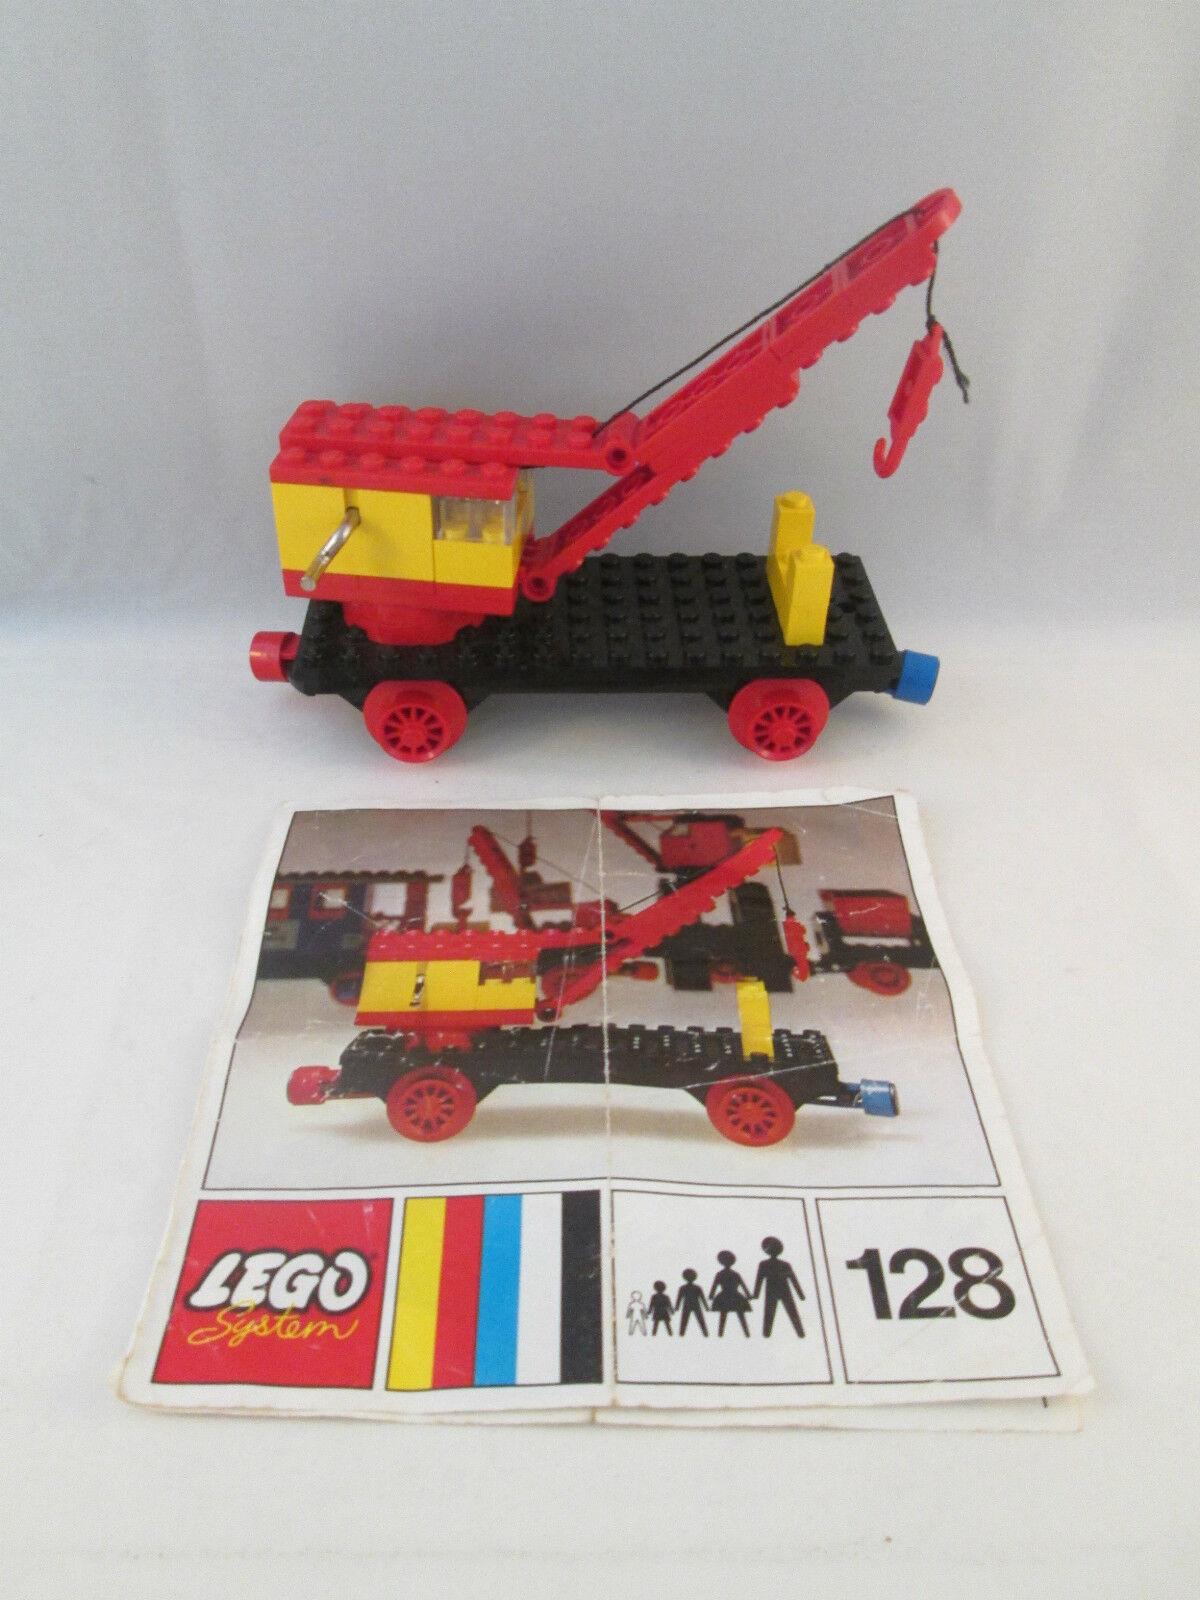 Lego Train 4.5V - 128 Mobile Mobile Mobile Crane (Train Base) e67bfc